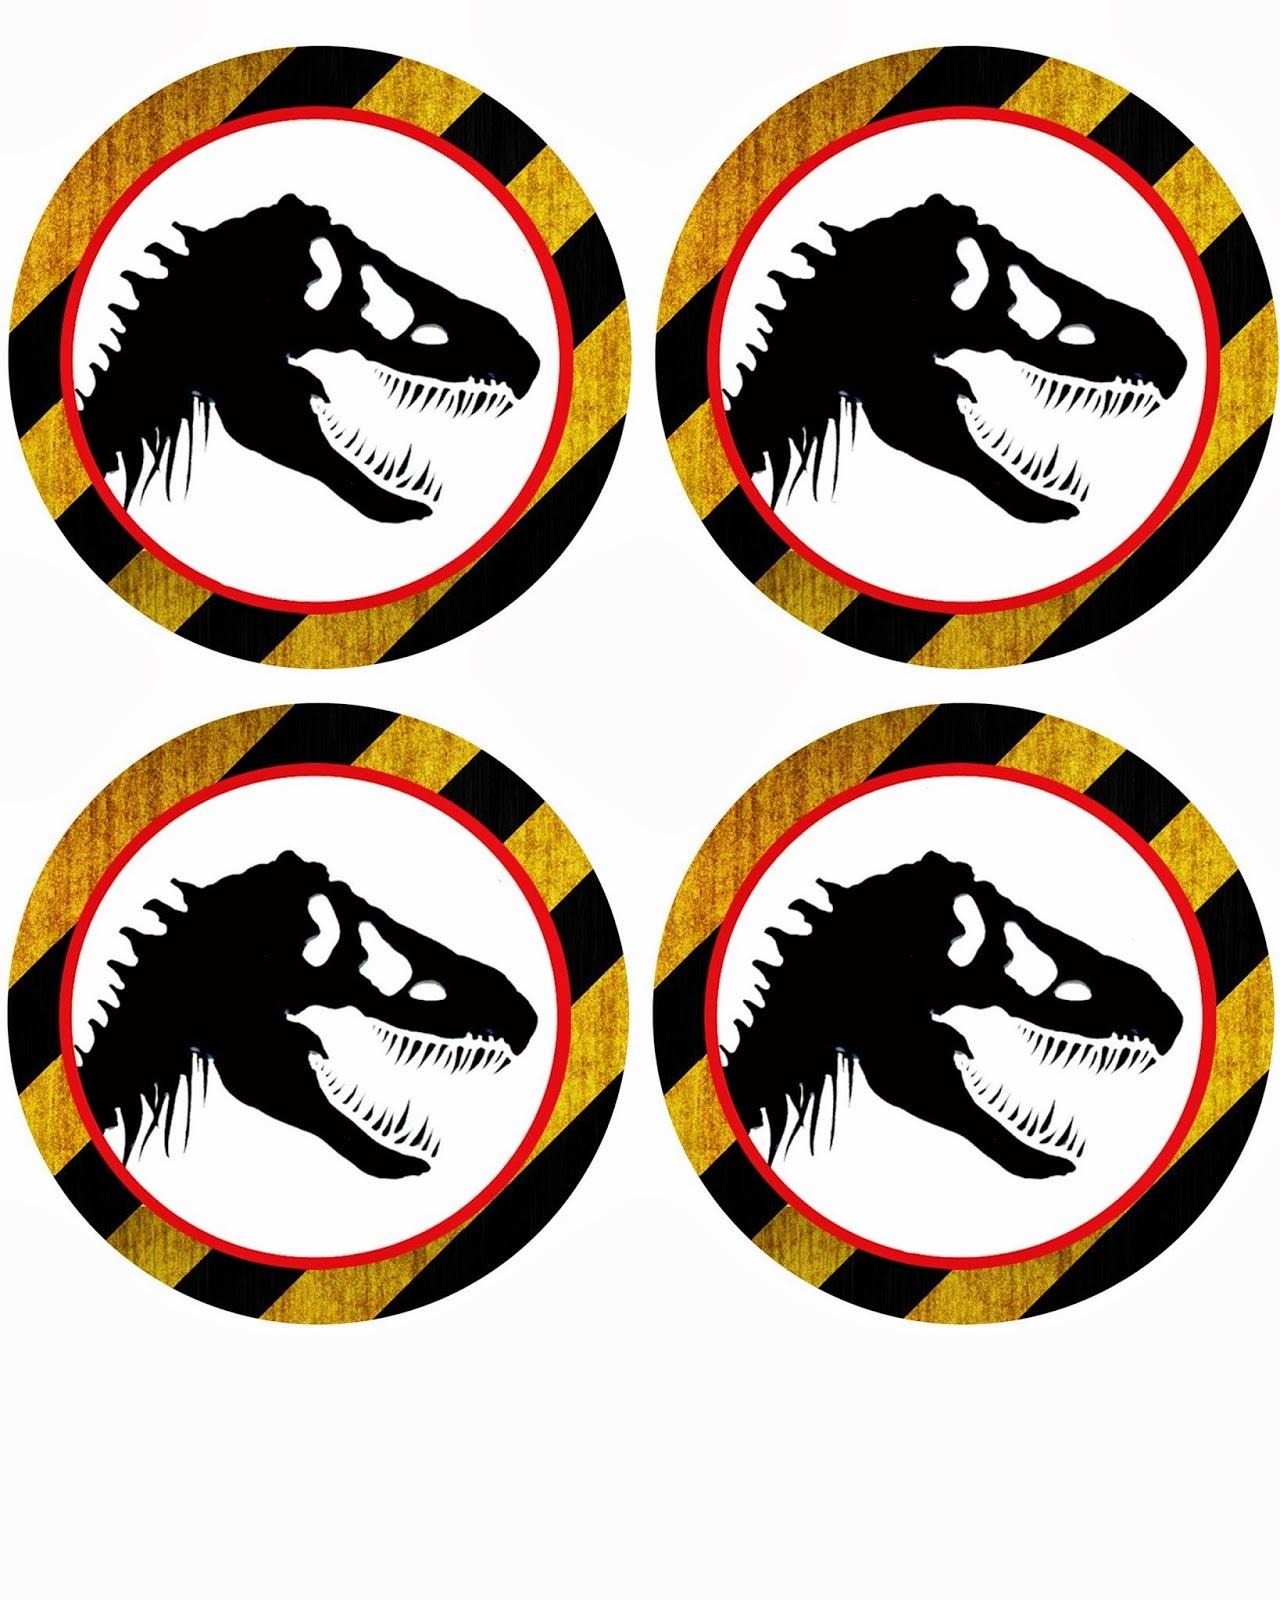 Free Dinosaur (Jurrasic Park) Party Printables - Jurassic World Free Printables